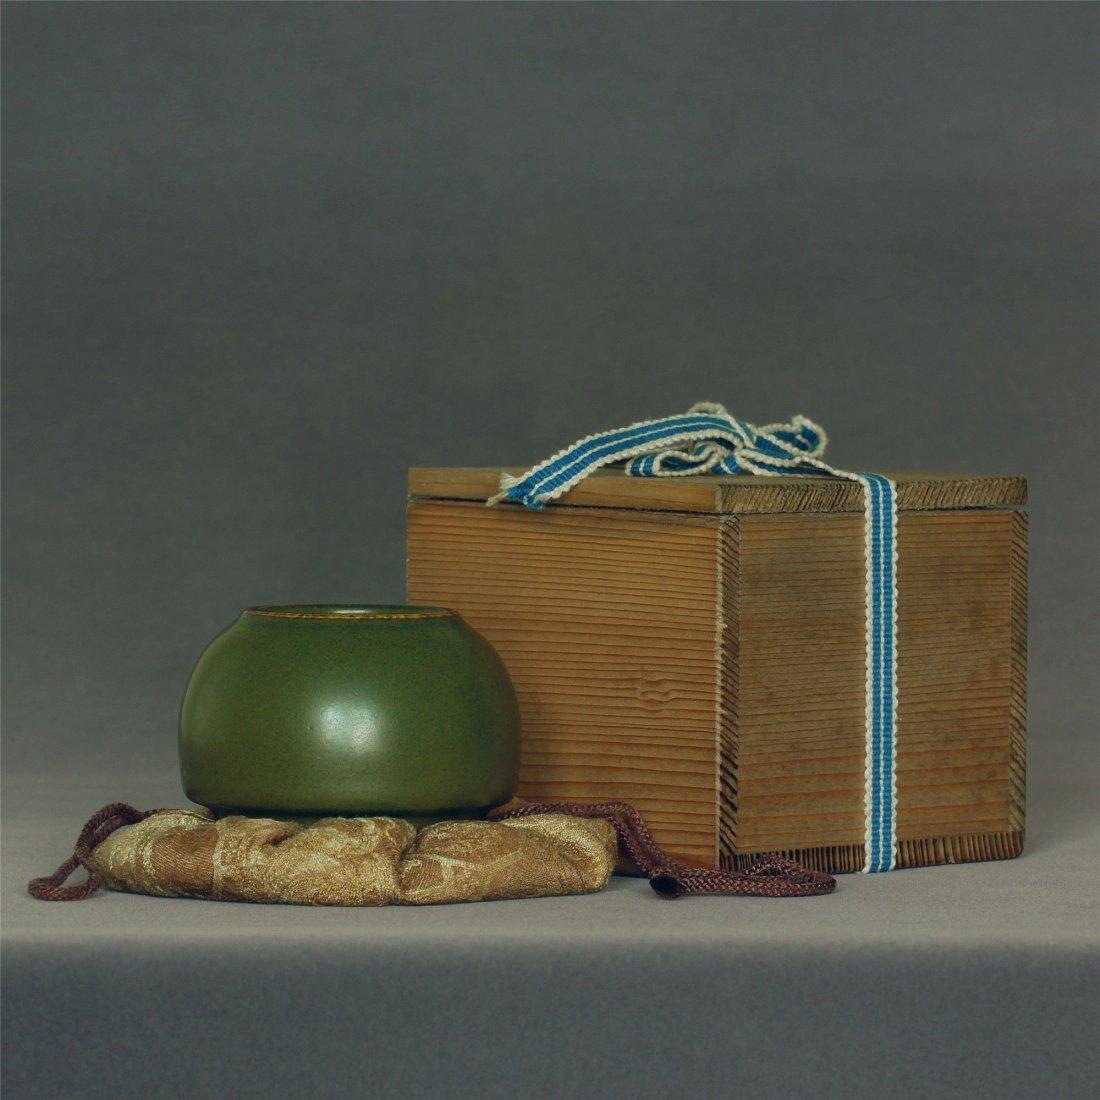 Tea glaze porcelain brush washer of Qing Dynasty